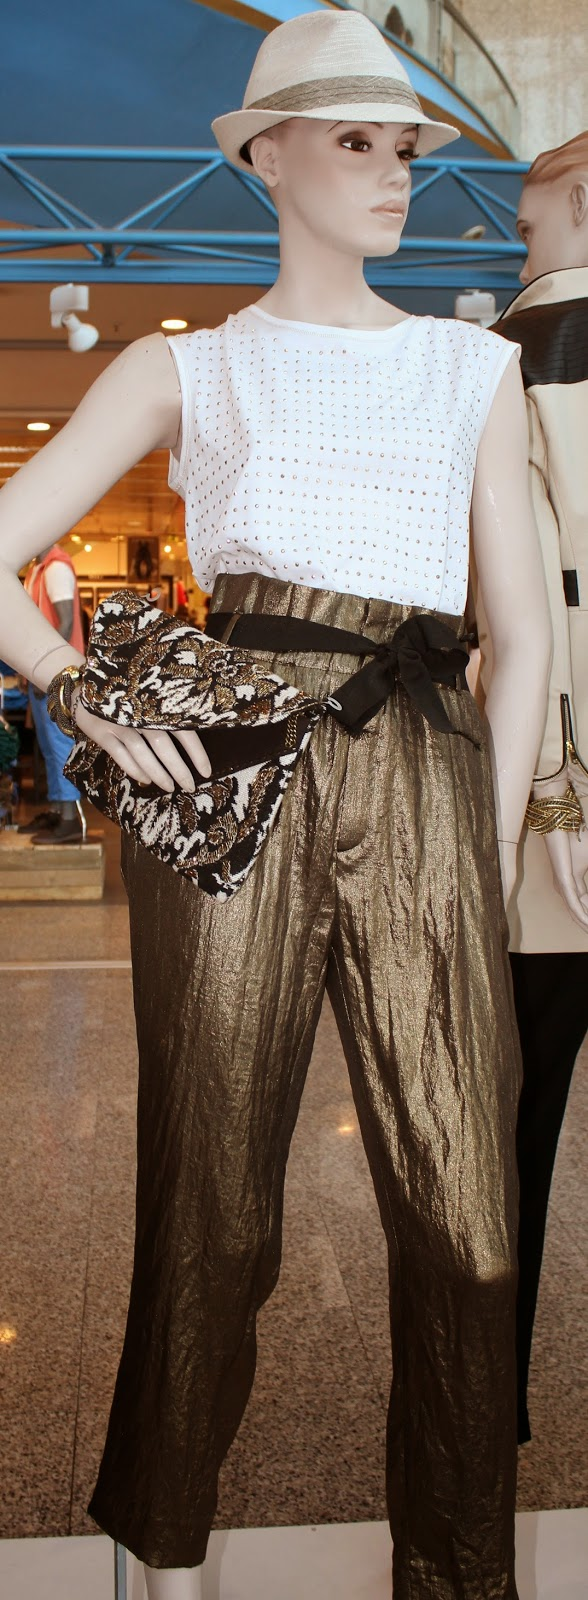 Br jula de estilo estrena moda estrena aniversario - Brujula de estilo ...